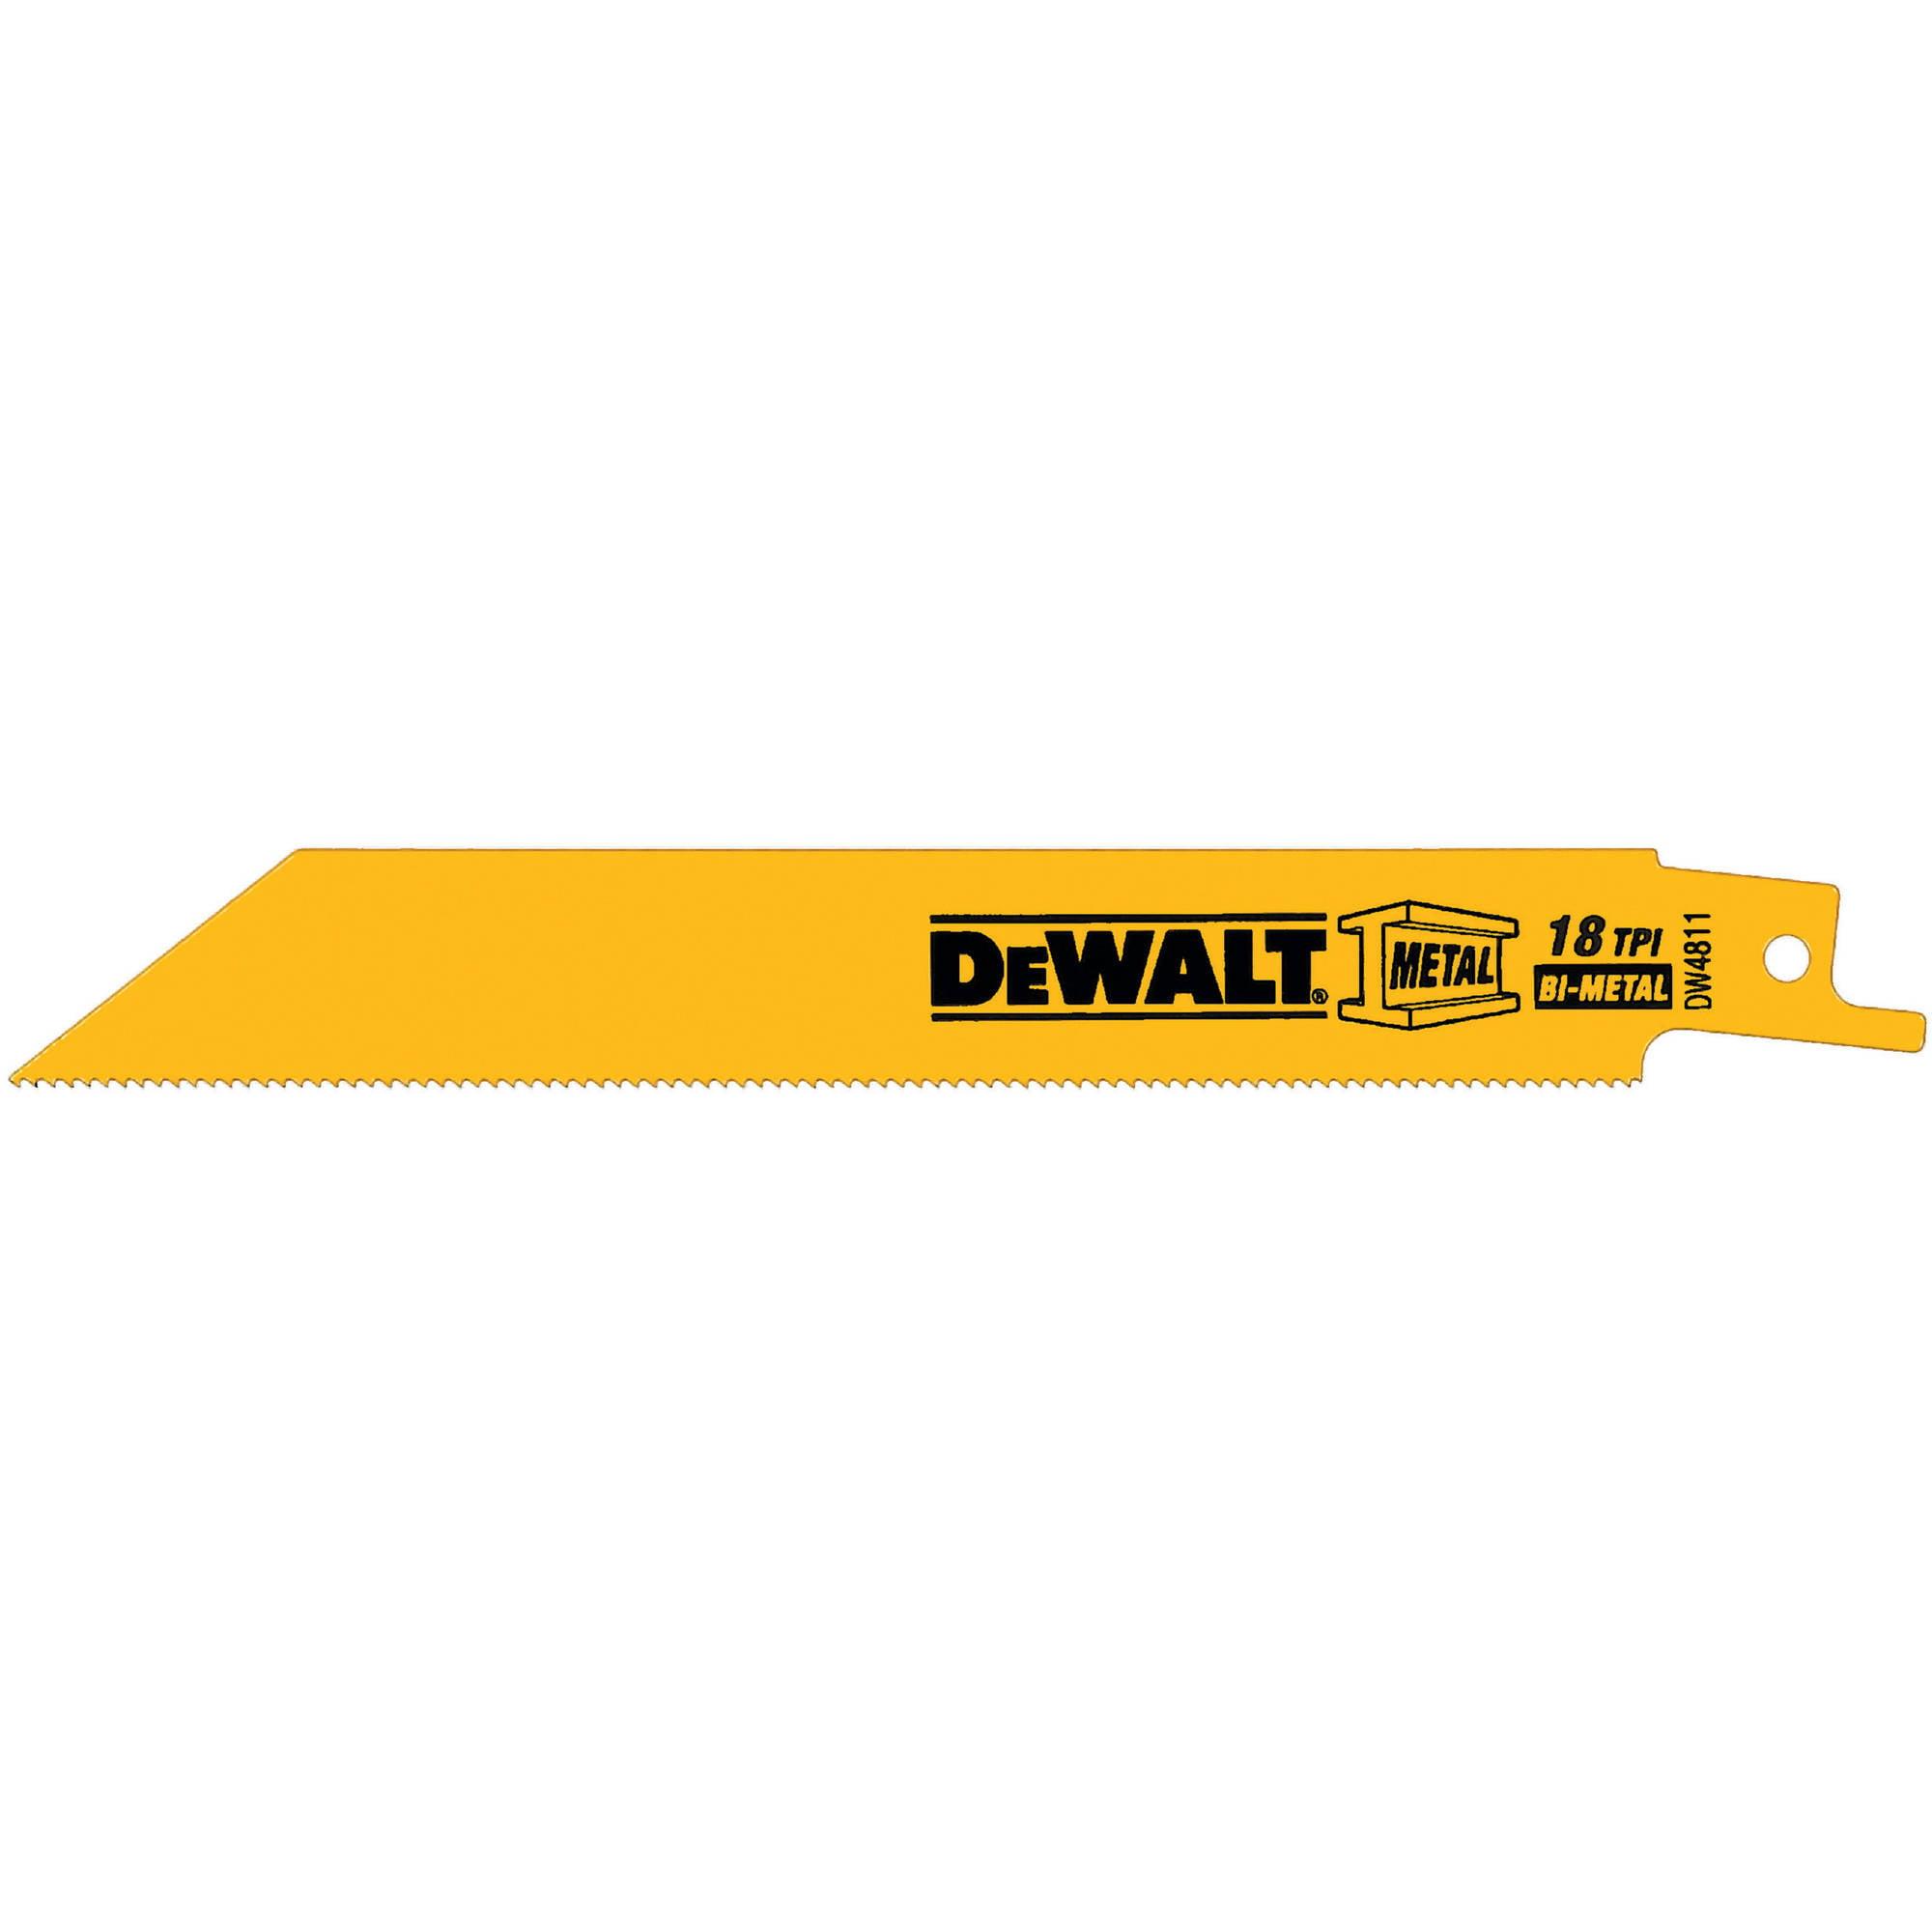 DeWalt® 18TPI Bi-Metal Blades 5 ct Pack